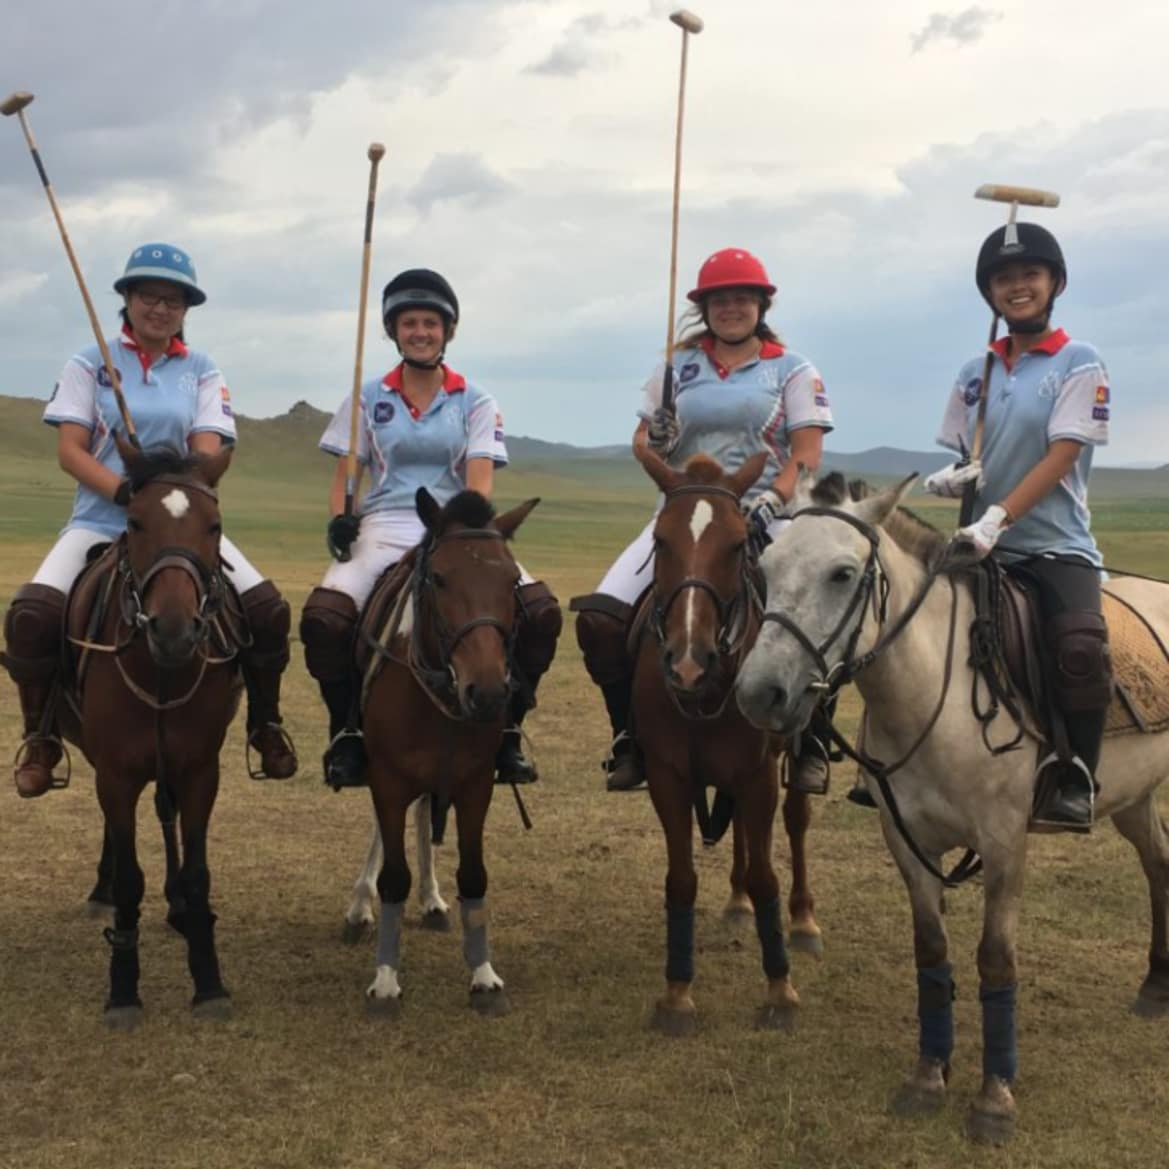 The Genghis Khan Polo Club  - The Pavilions Mongolia